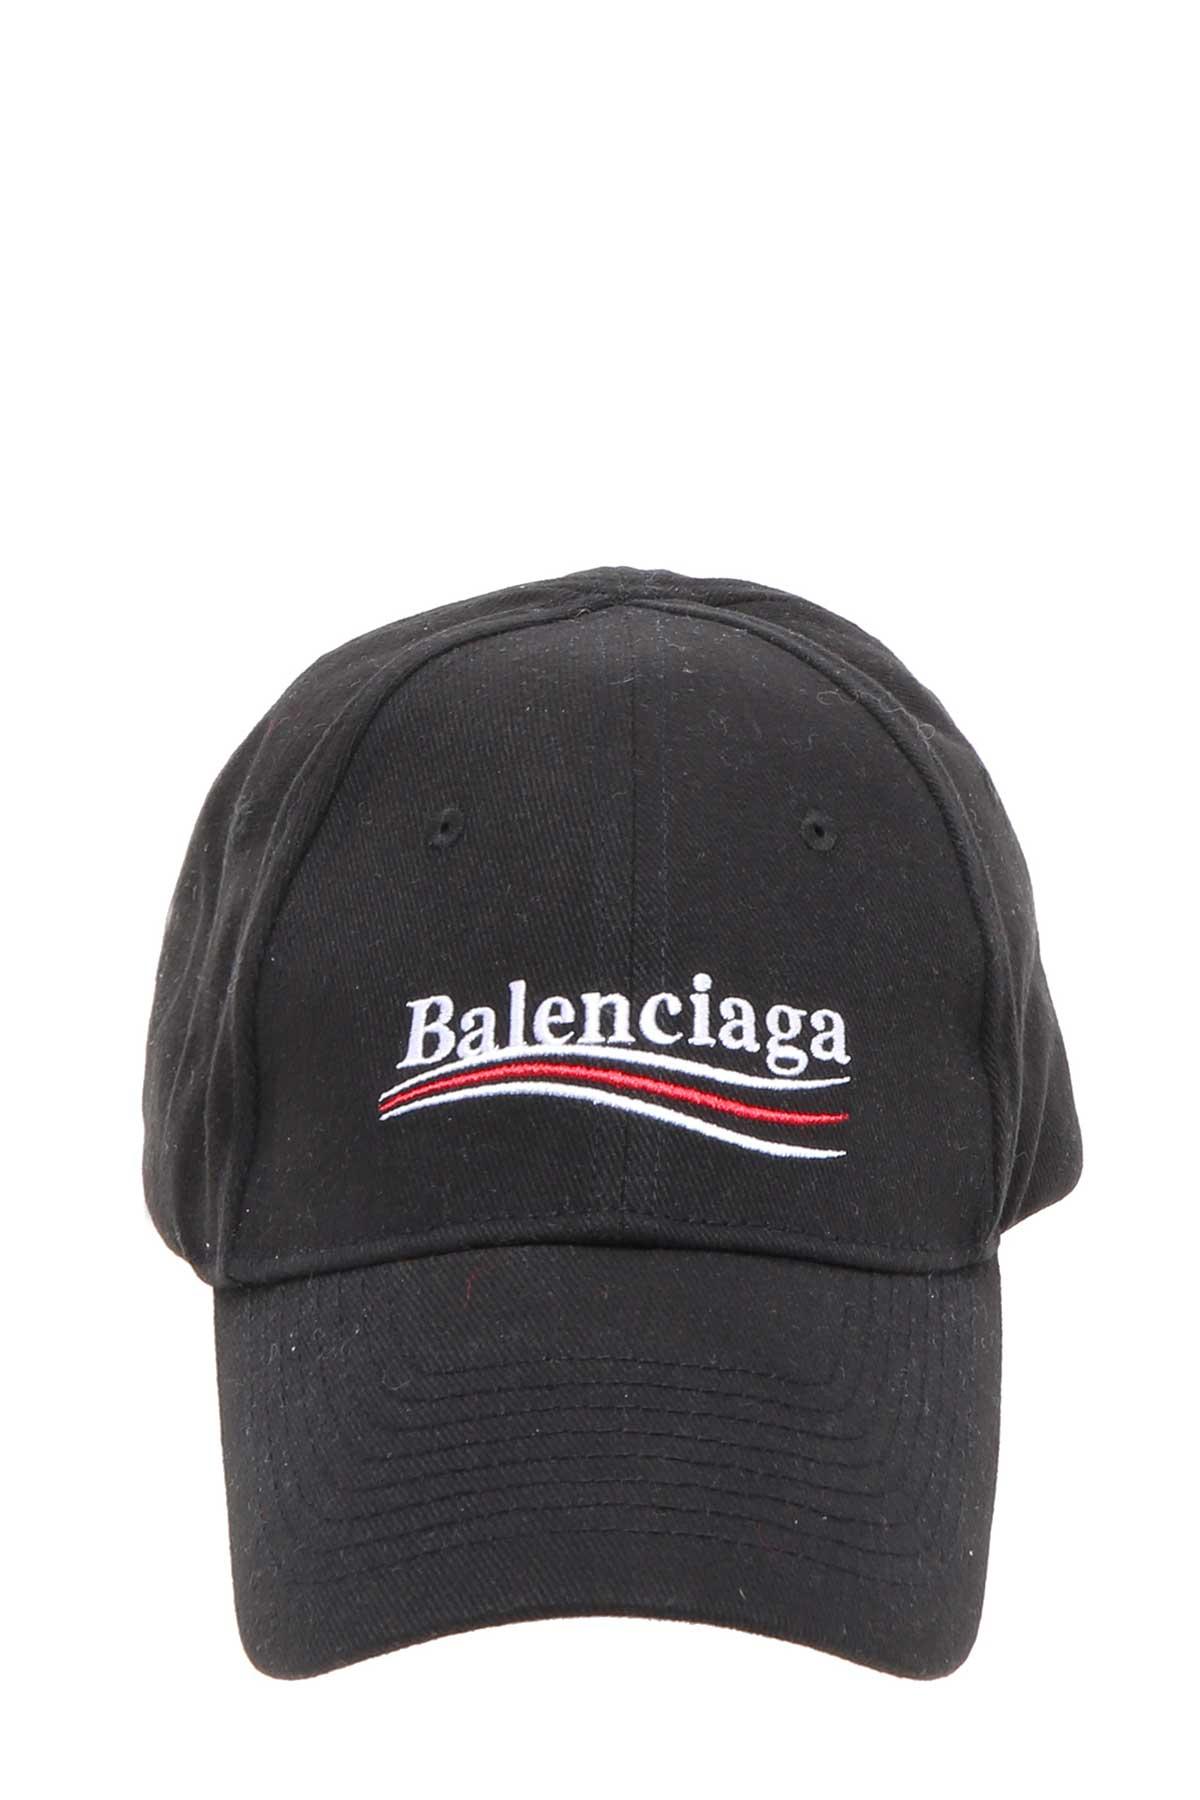 BALENCIAGA Embroidered Cotton-Twill Baseball Cap 9747fb54f08a